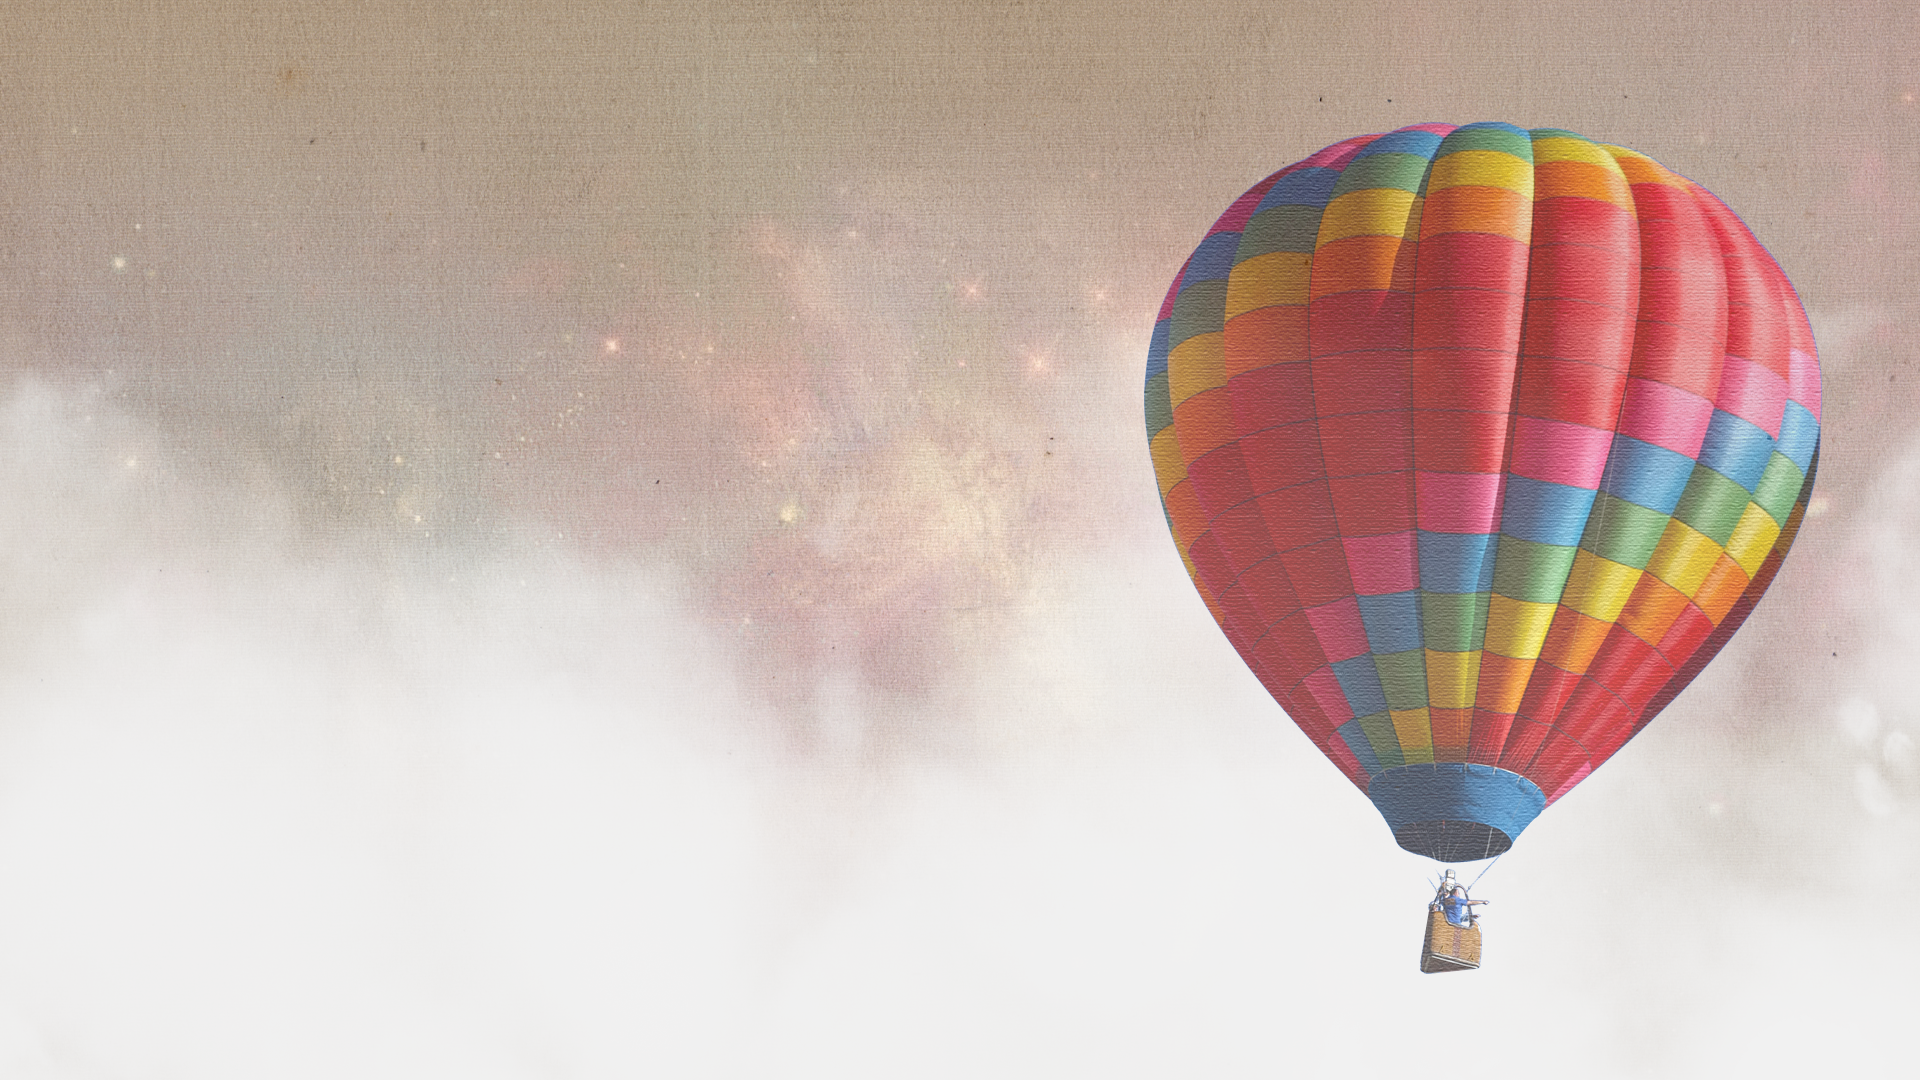 Canvas Balloon Wallpaper By Eeveling On Deviantart